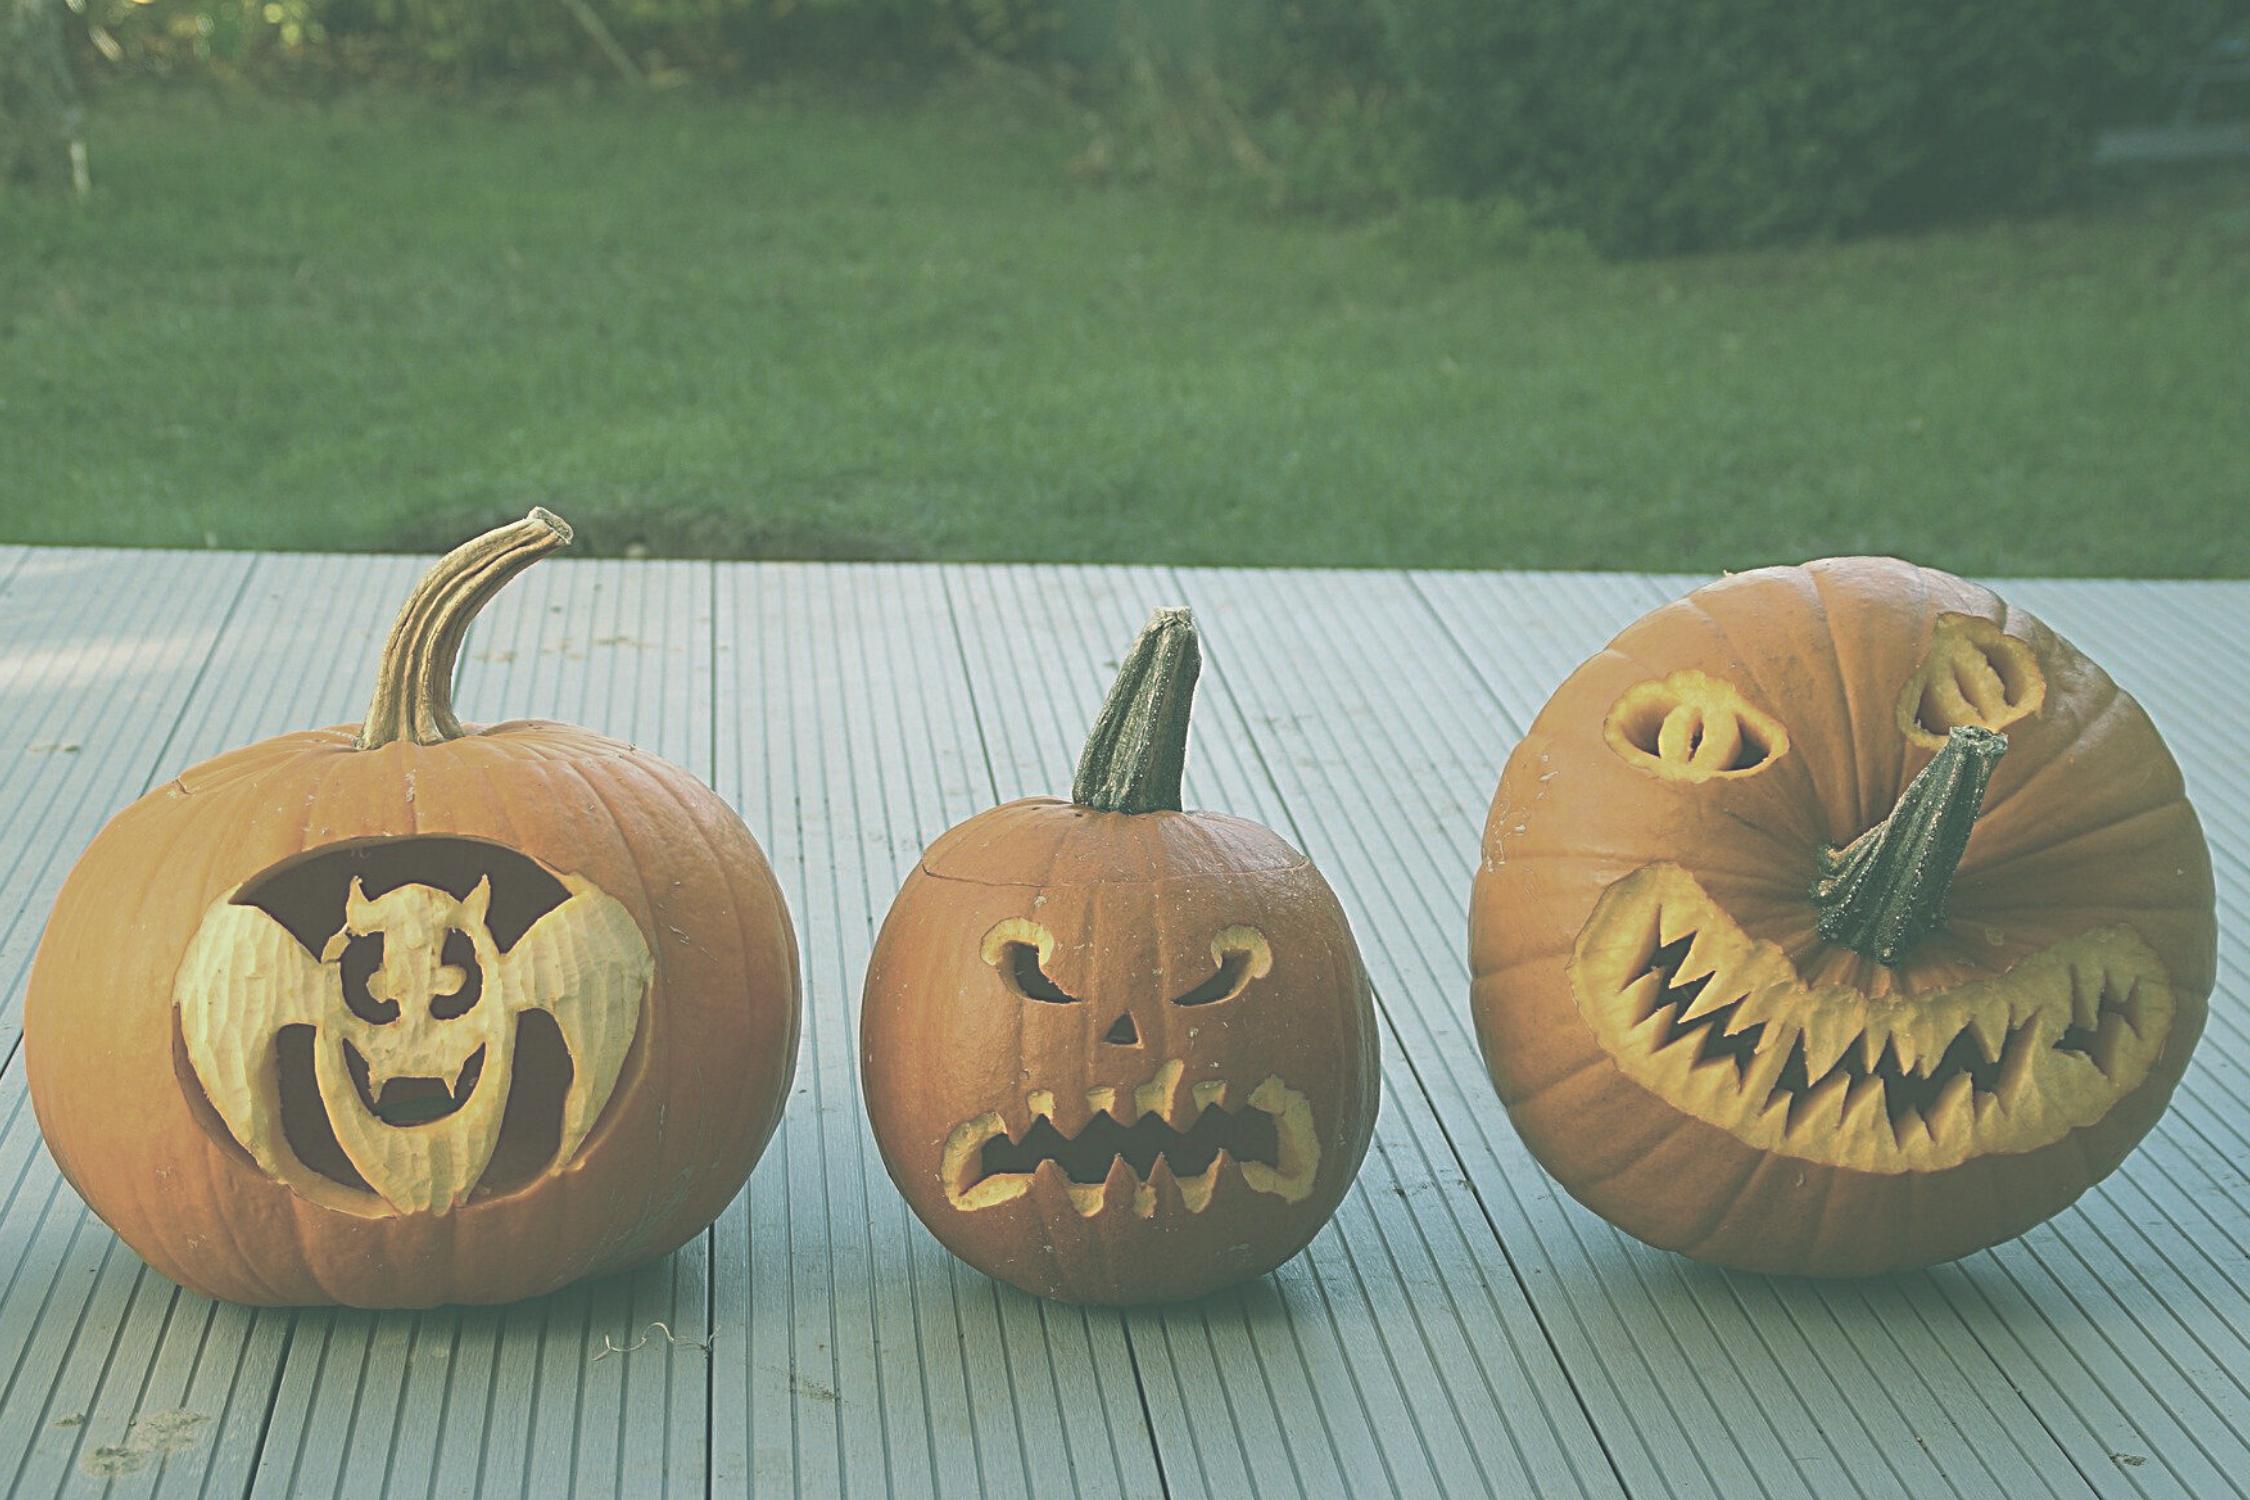 apps de halloween para niños, apps autismo, halloween 2020, apps para niños